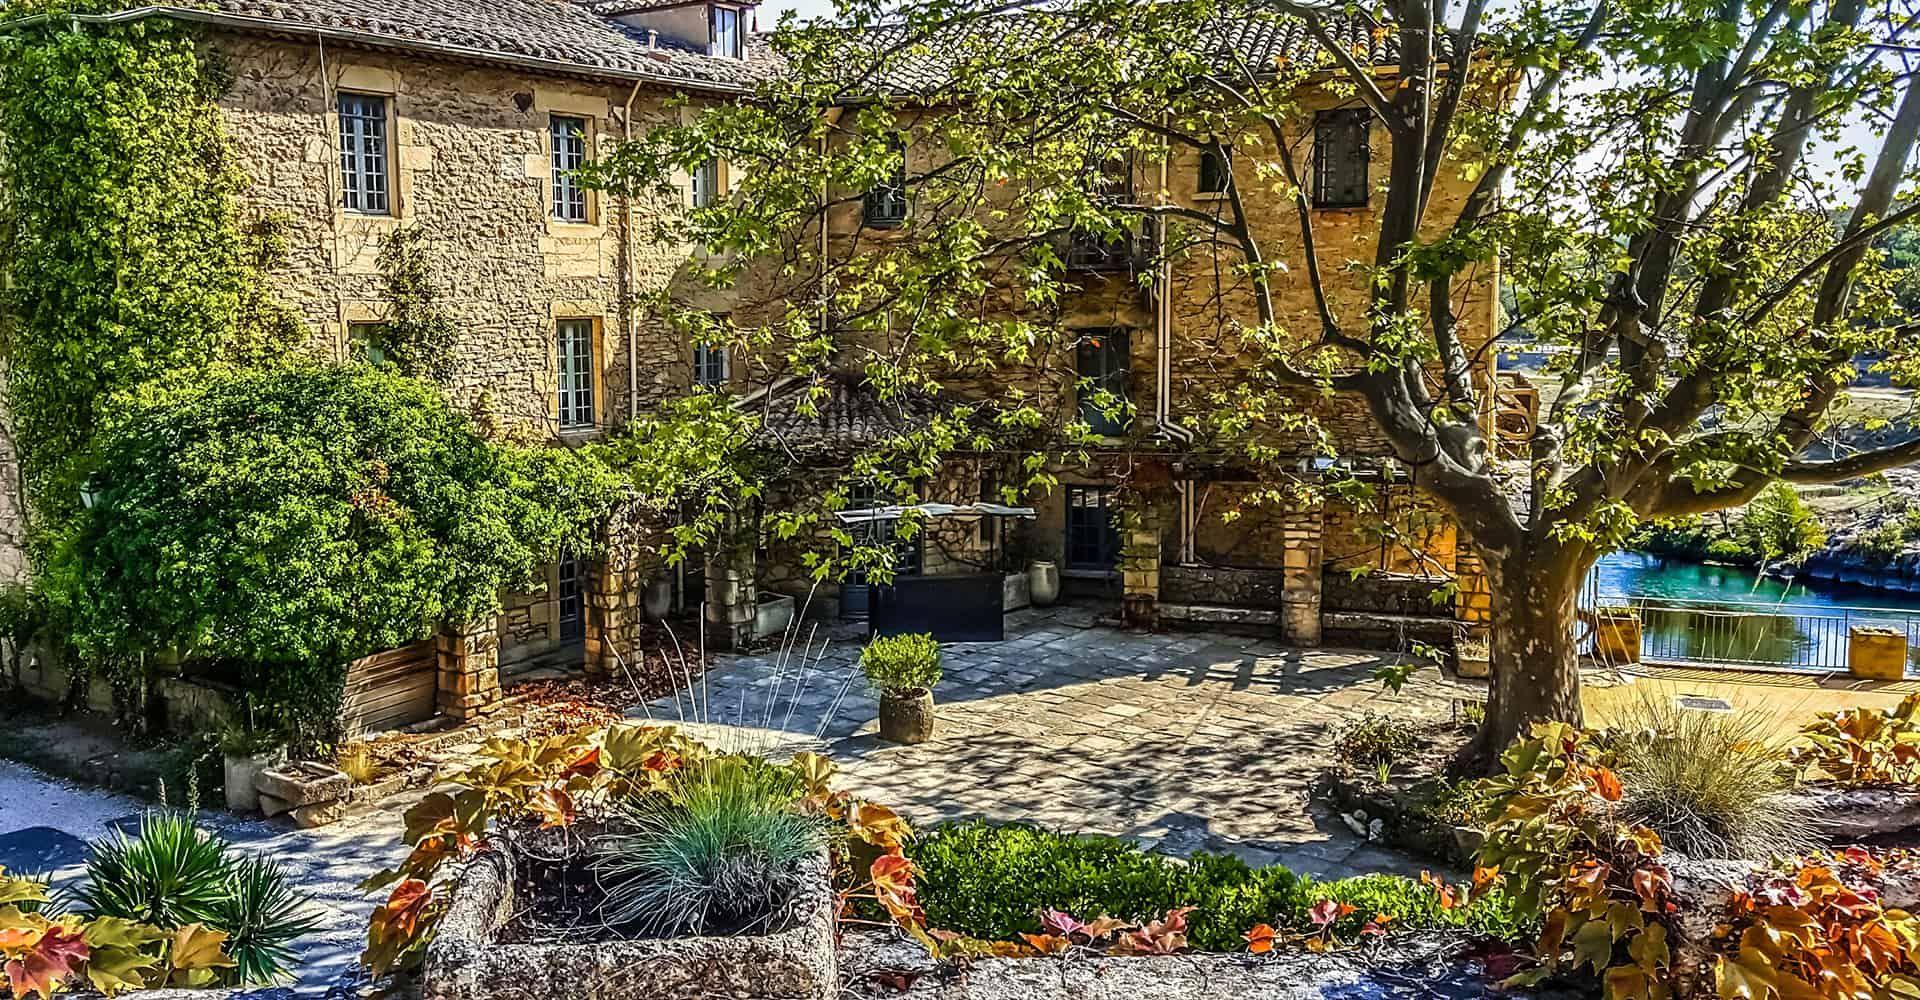 5 Garden Design Ideas To Match Your Lifestyle ... on Small Mediterranean Patio Ideas id=18208